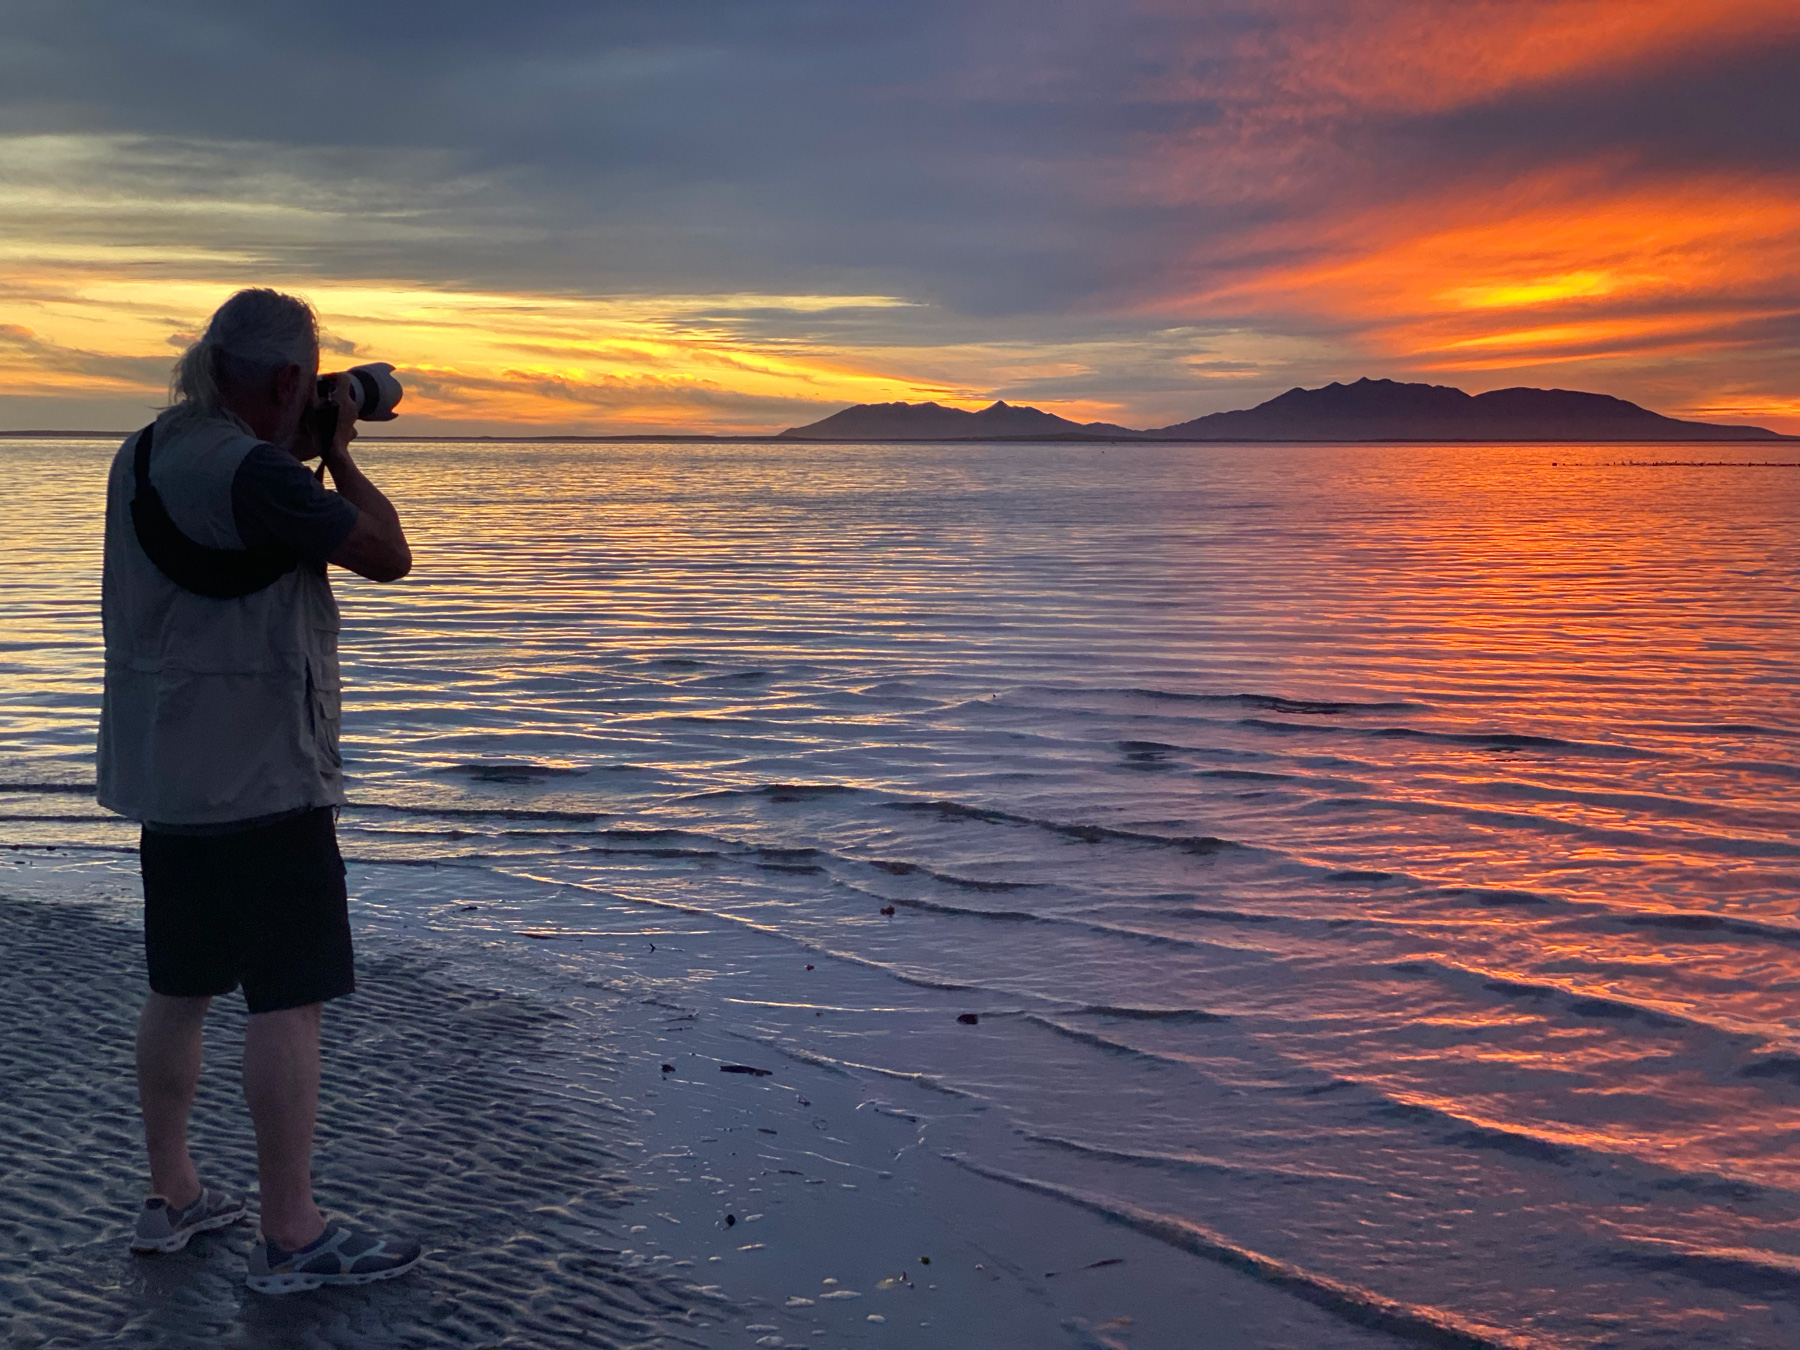 Sunset in Mag bay, Bahia Magdalena. Baja California, Mexico. Mar y Arena Hotel